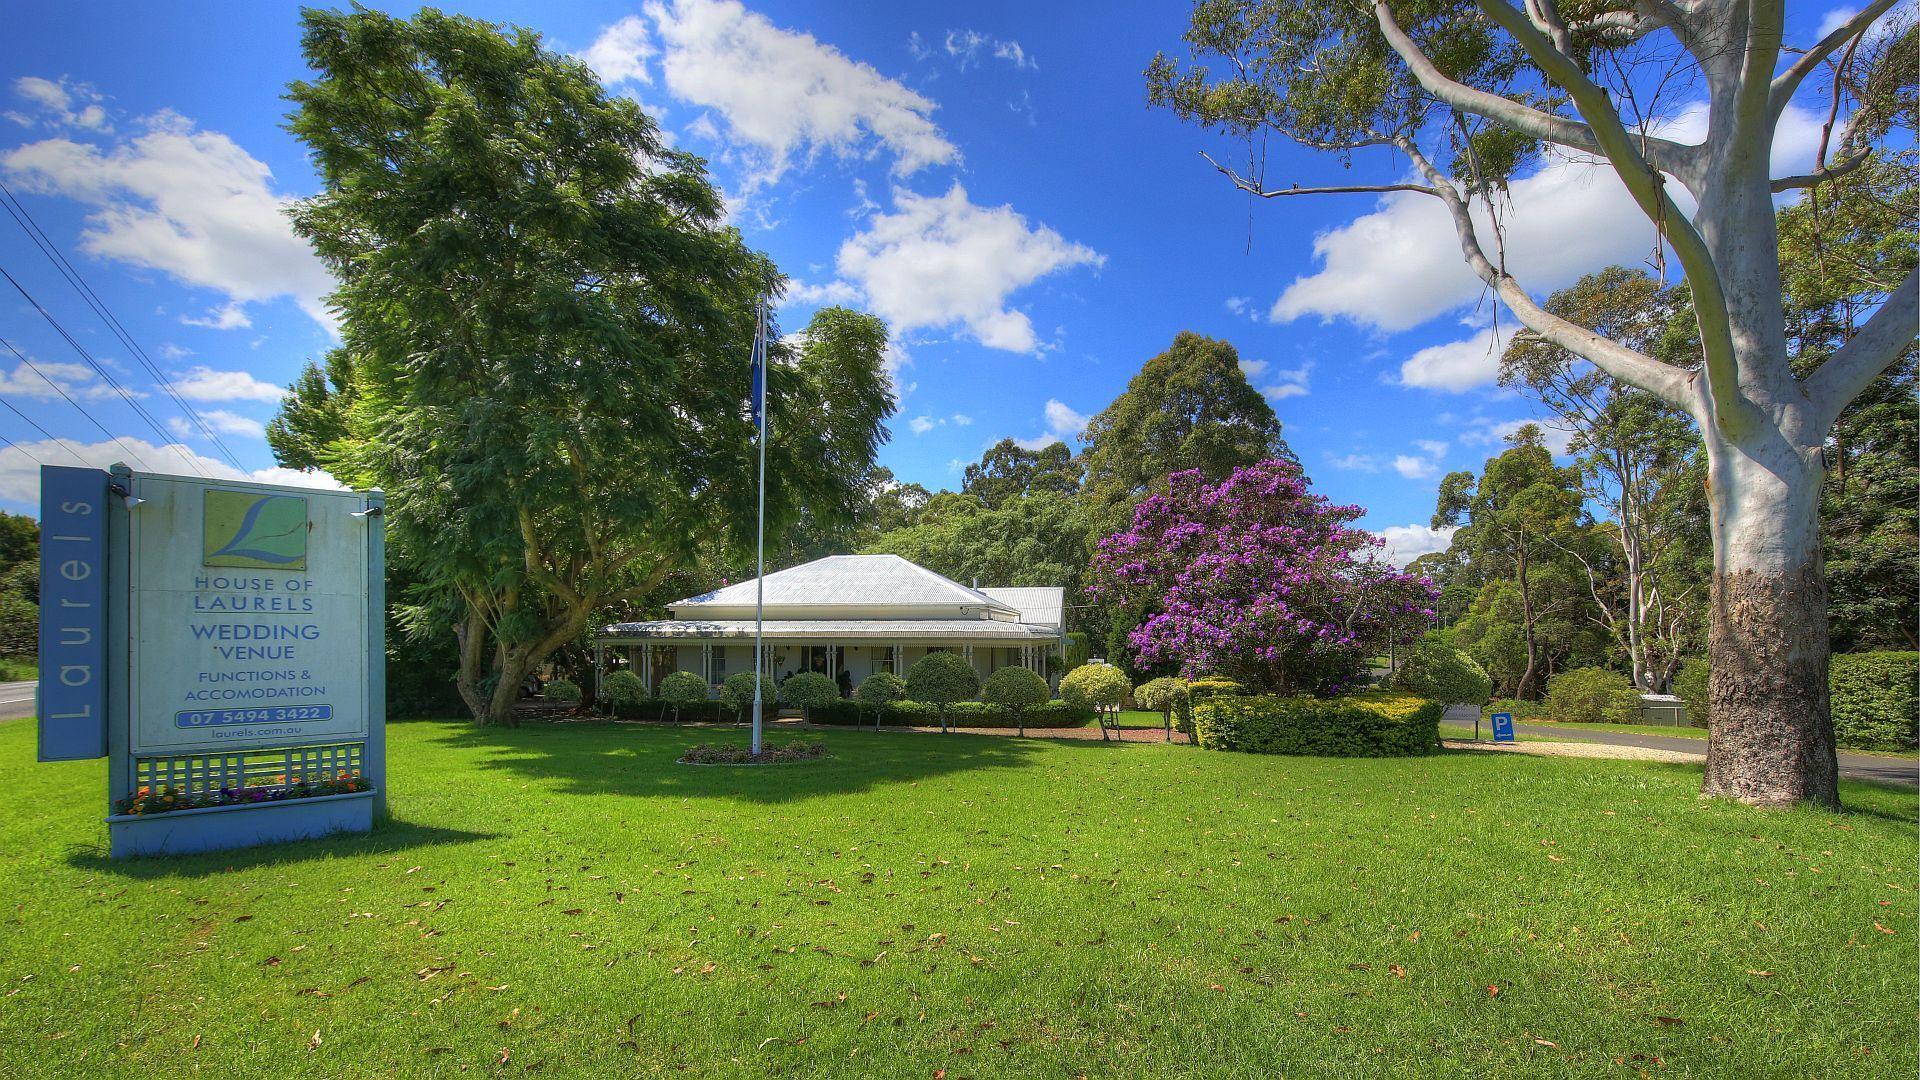 953 Maleny - Montville Rd, Balmoral Ridge QLD 4552, Image 1